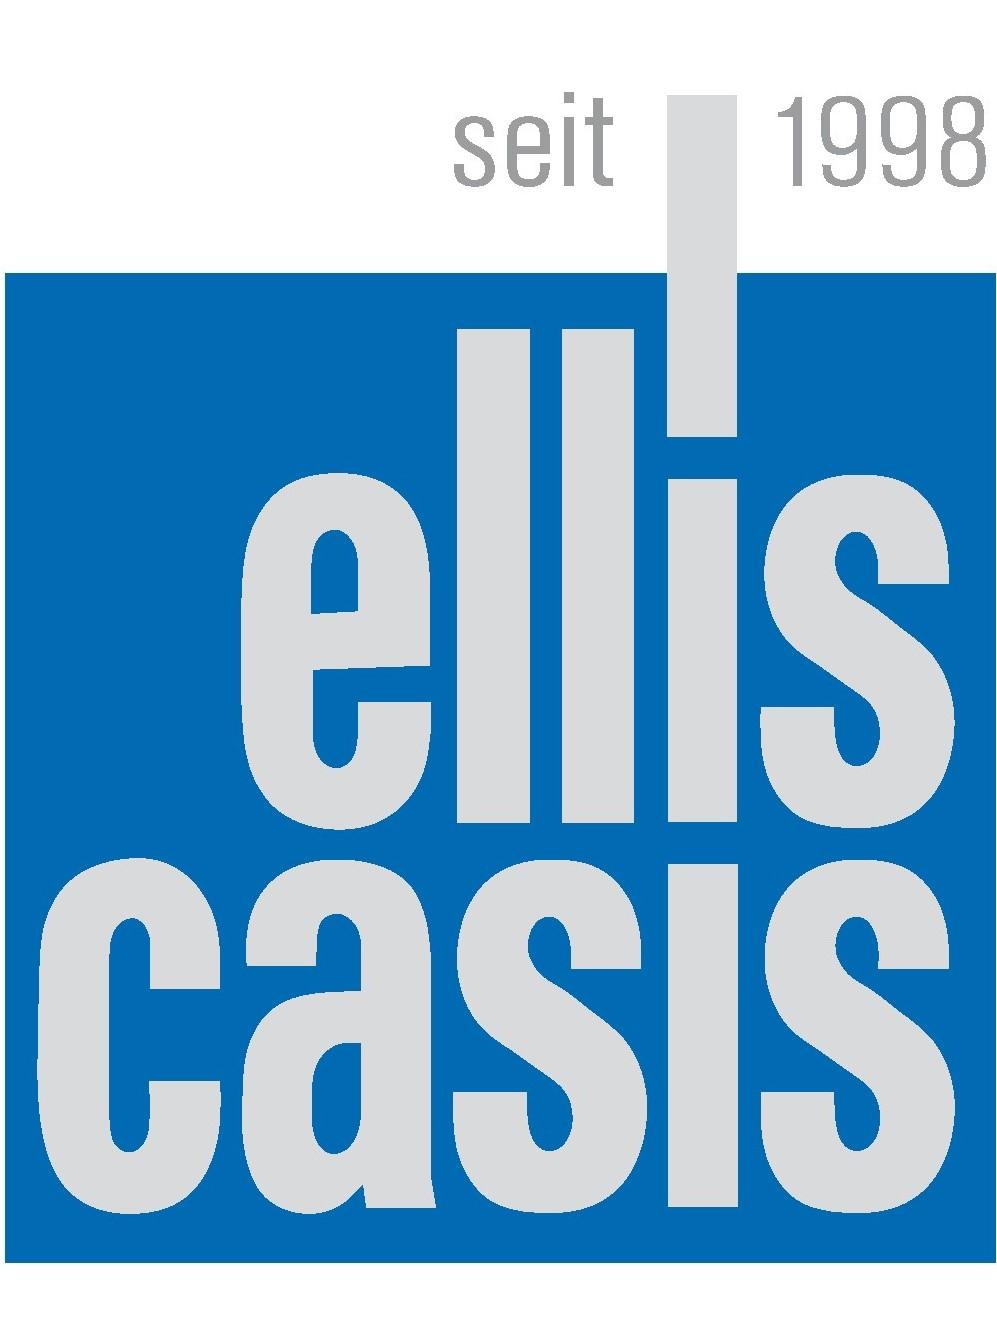 Elliscasis Immobilien GmbH